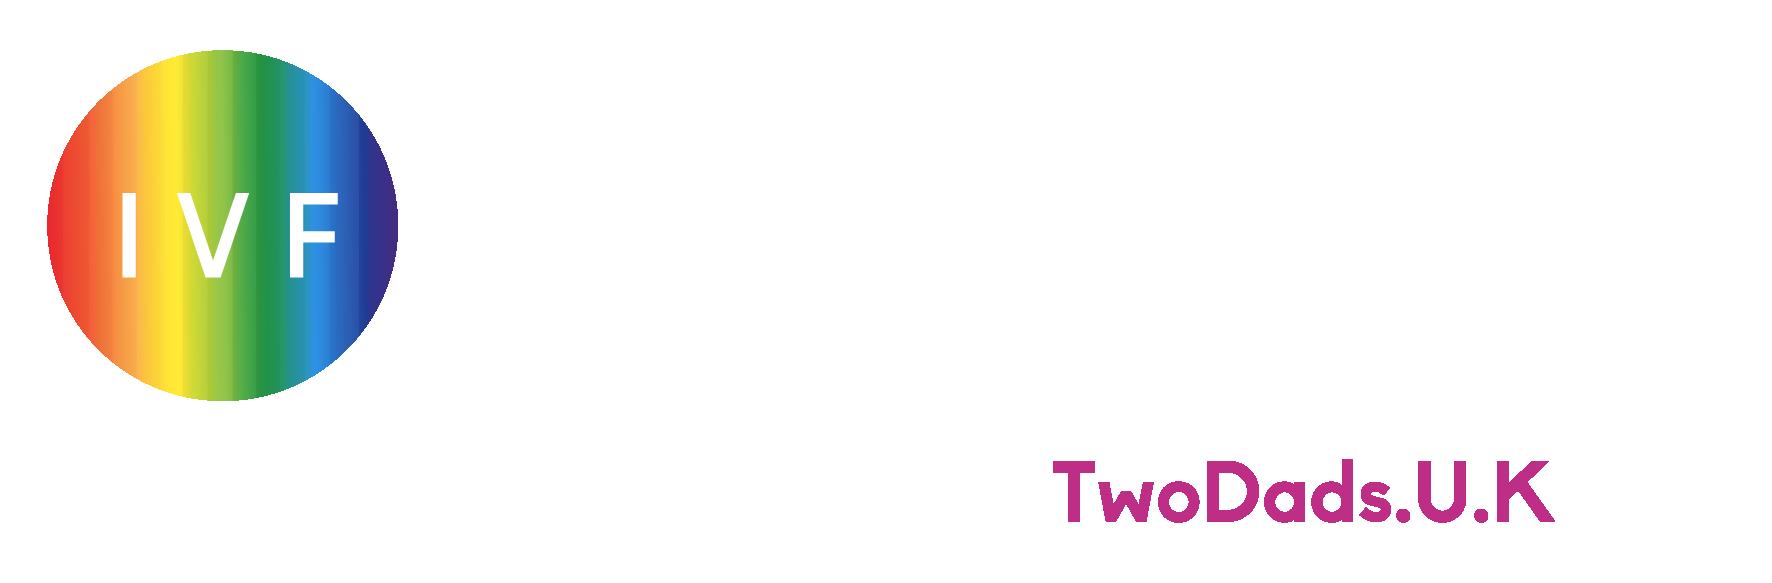 IVFbabble LGBT